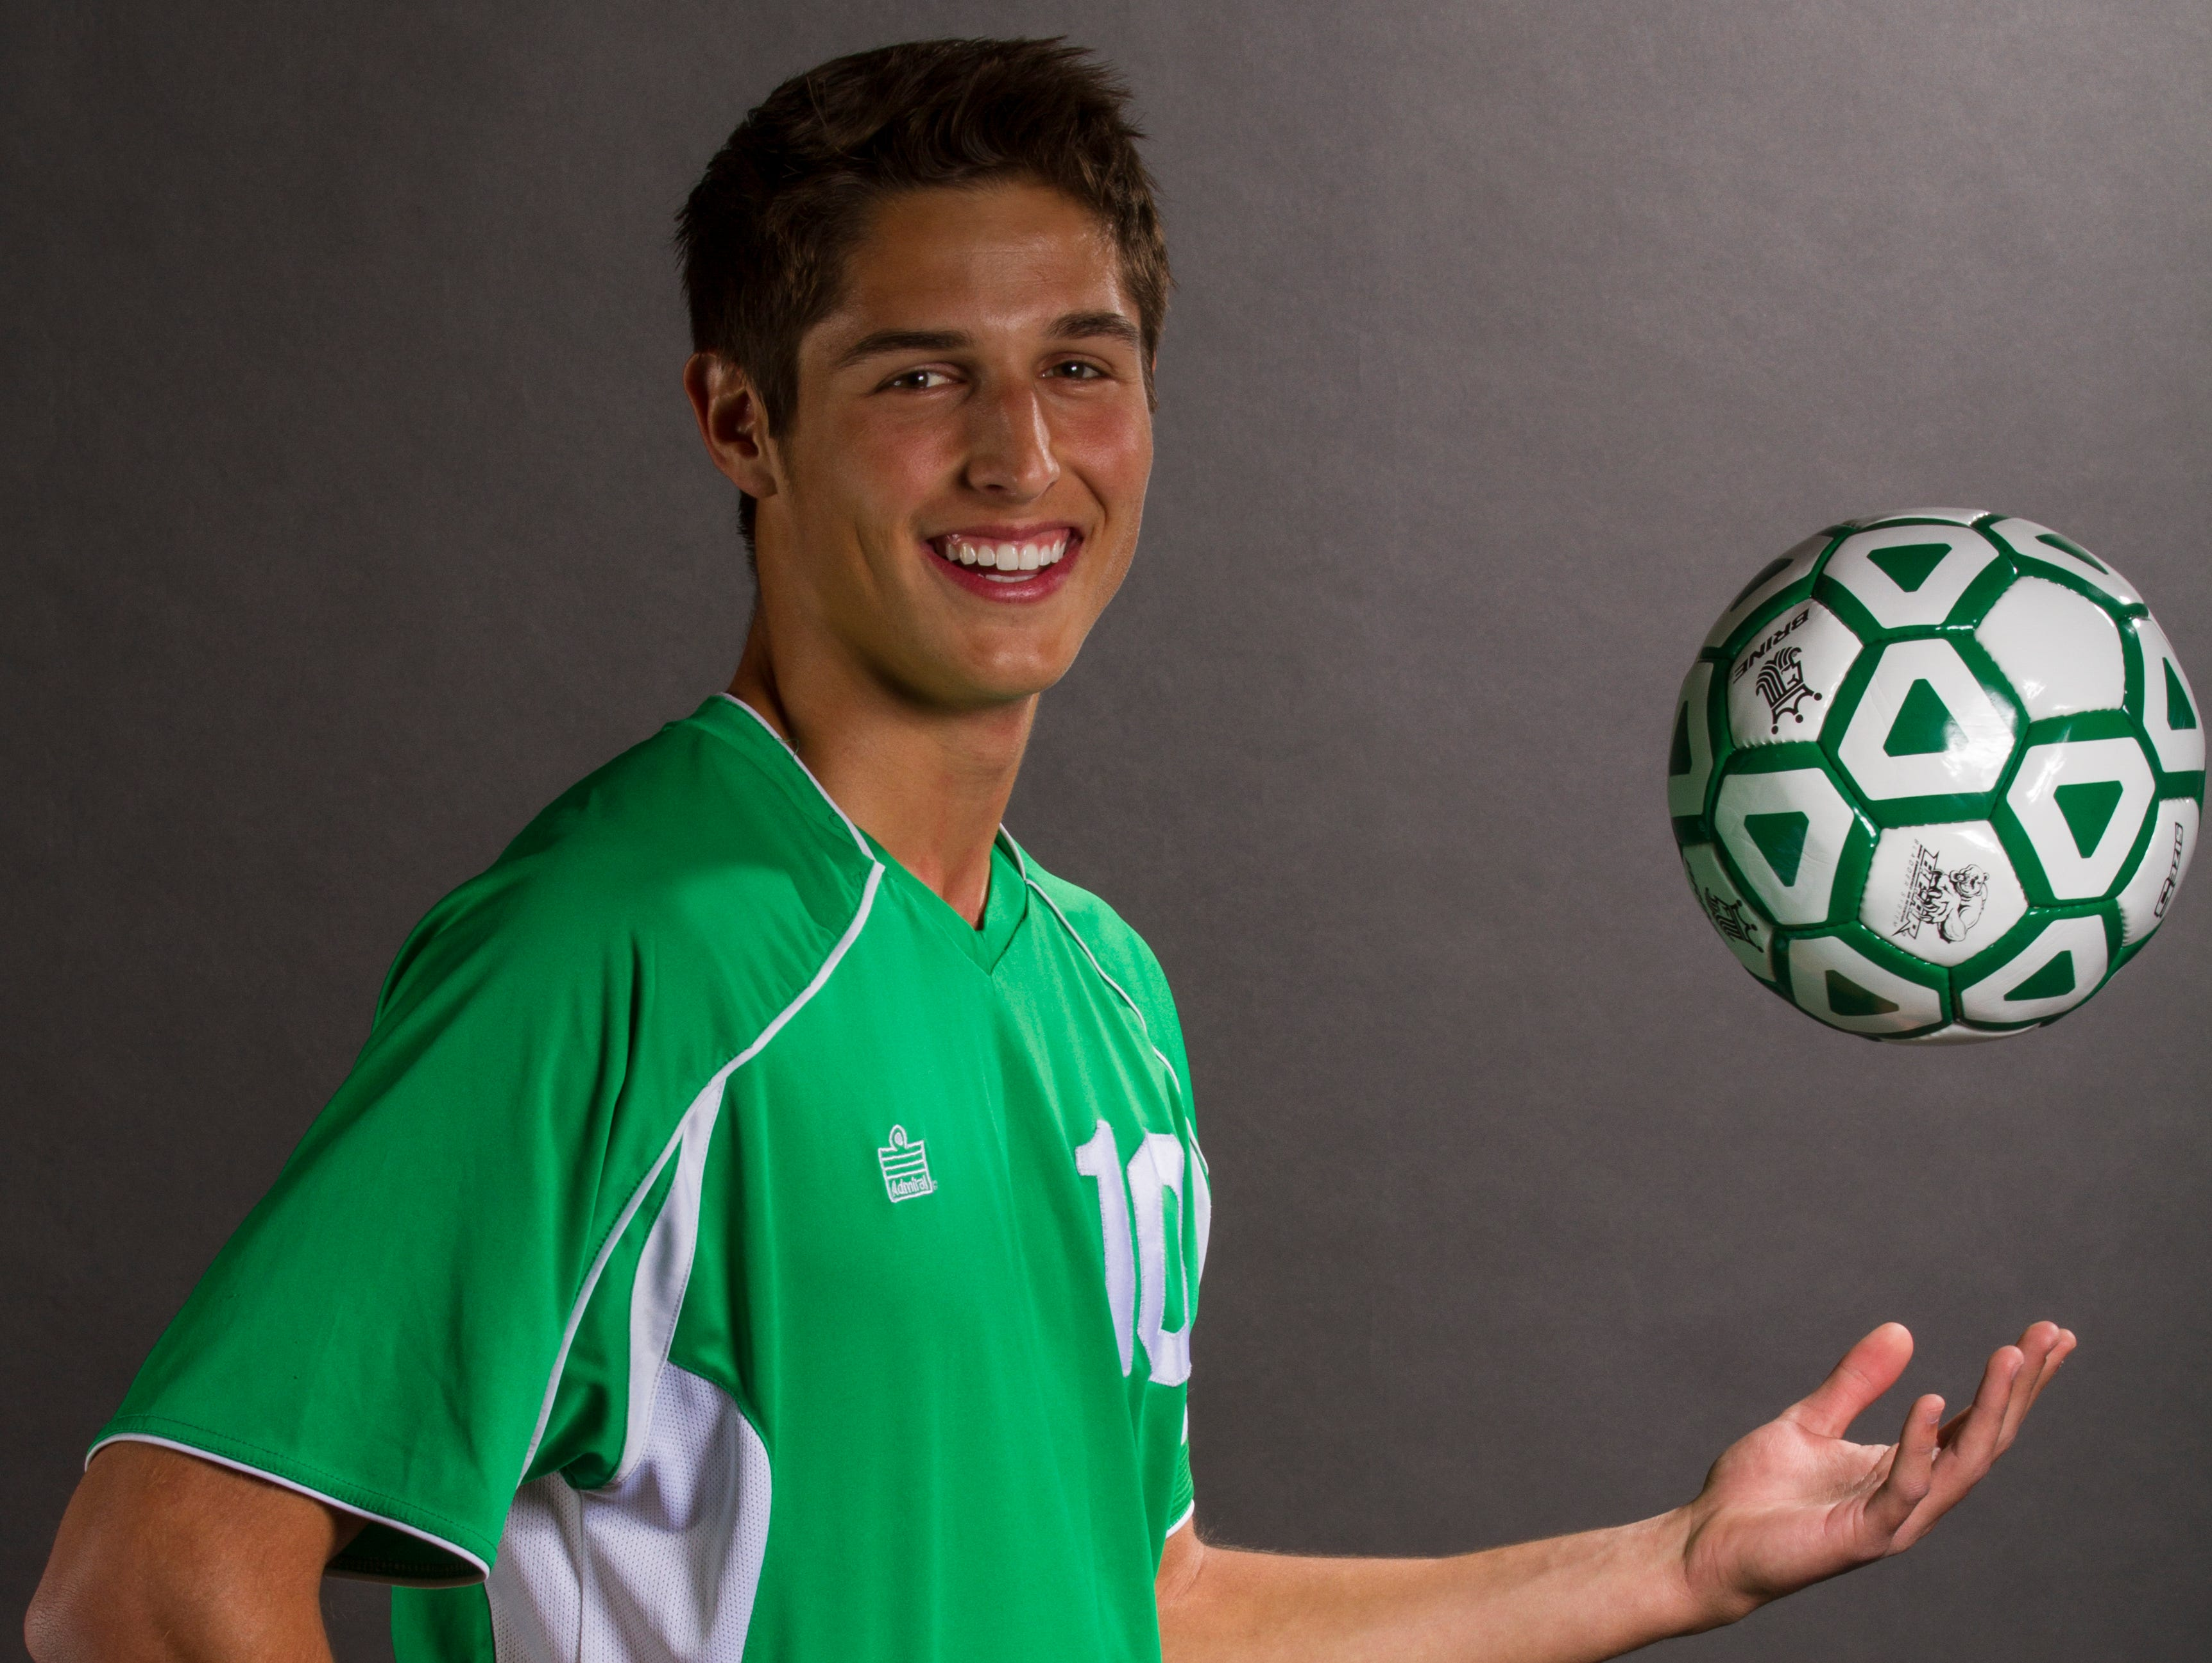 Adam Everett, 18, is a senior soccer player at Fort Myers High School.